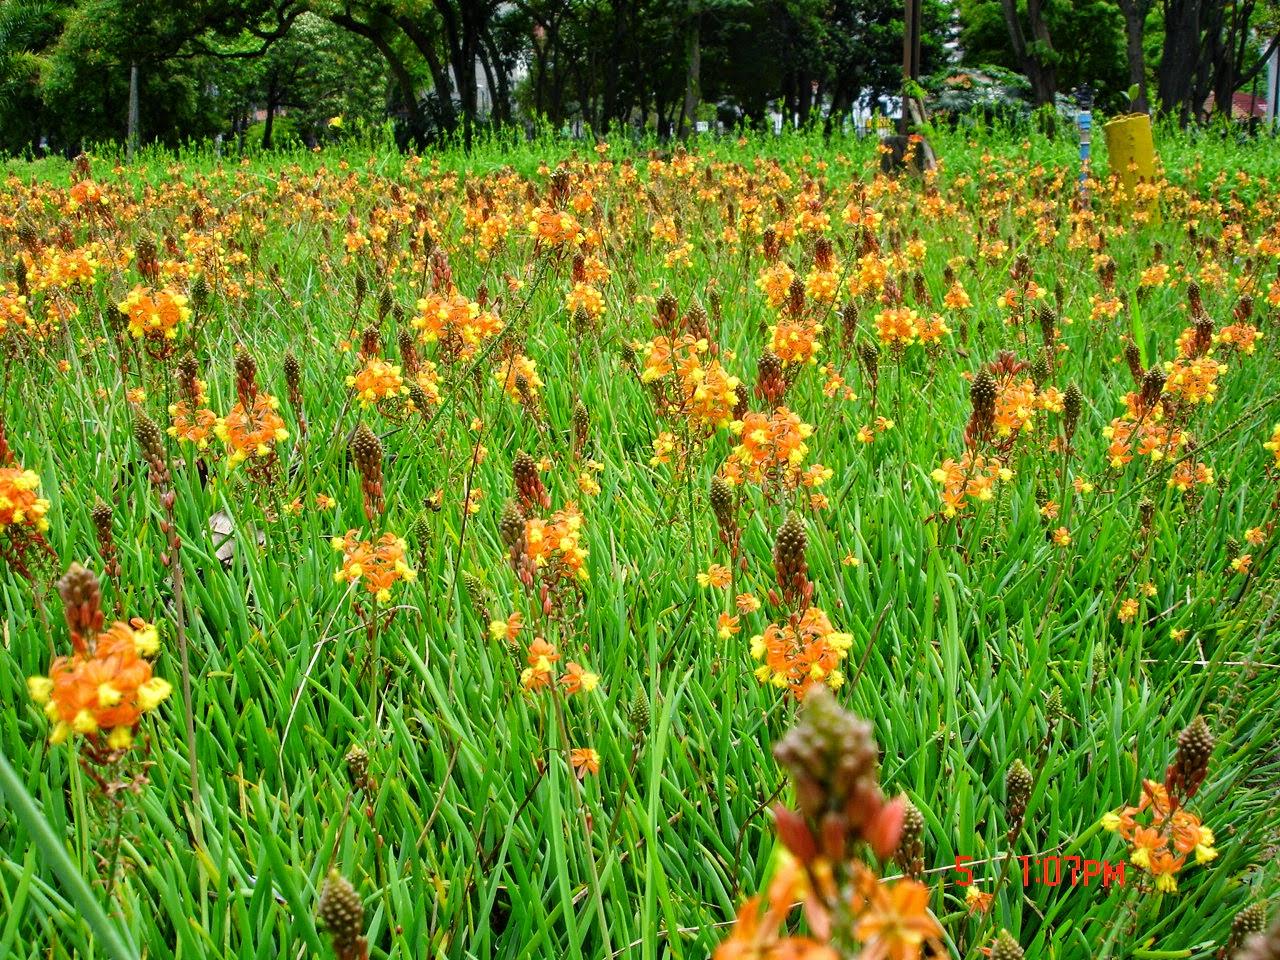 flor de jardim amarela: cantinho verde: BULBINE, CEBOLINHA-DE-JARDIM – ( Bulbine frutescens